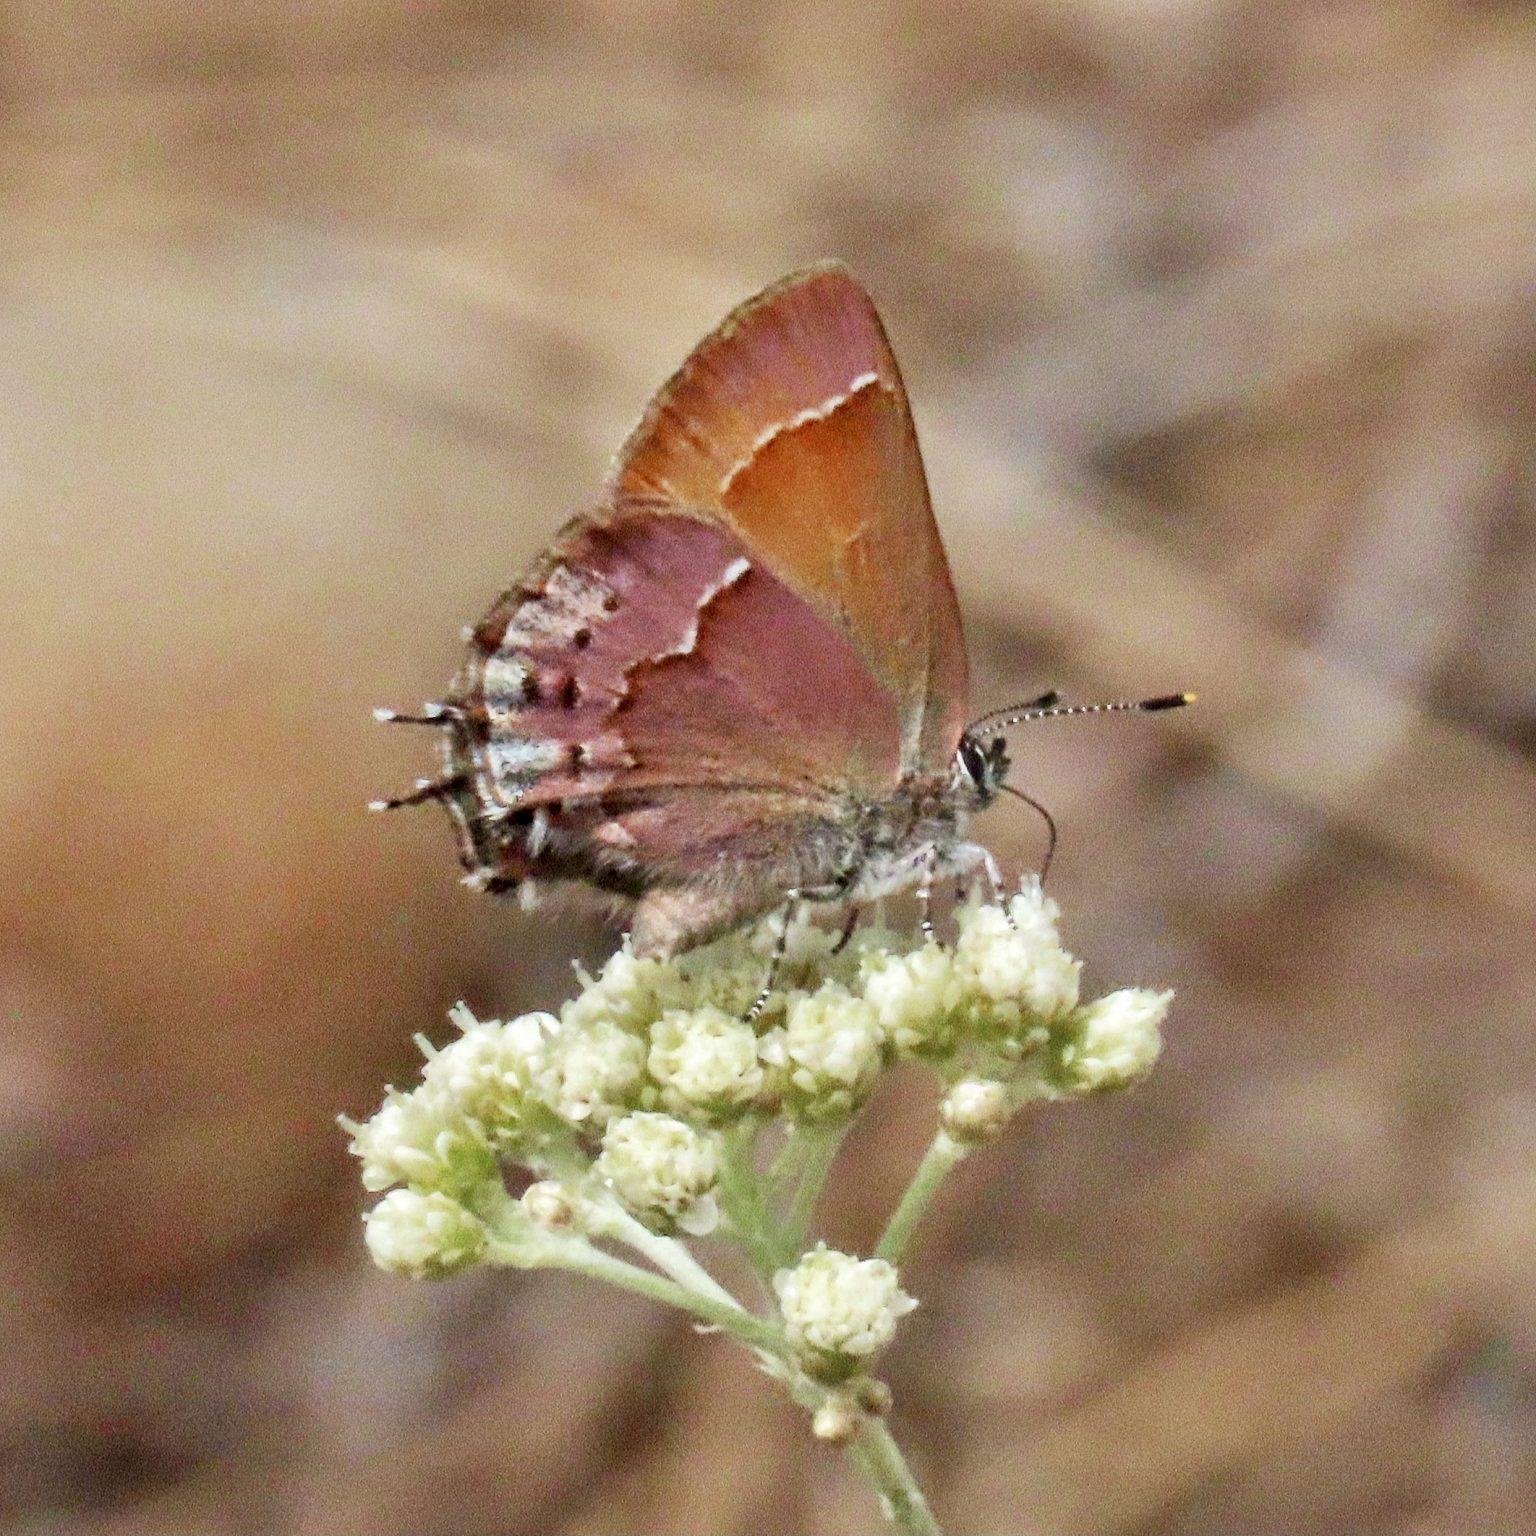 Callophrys gryneus